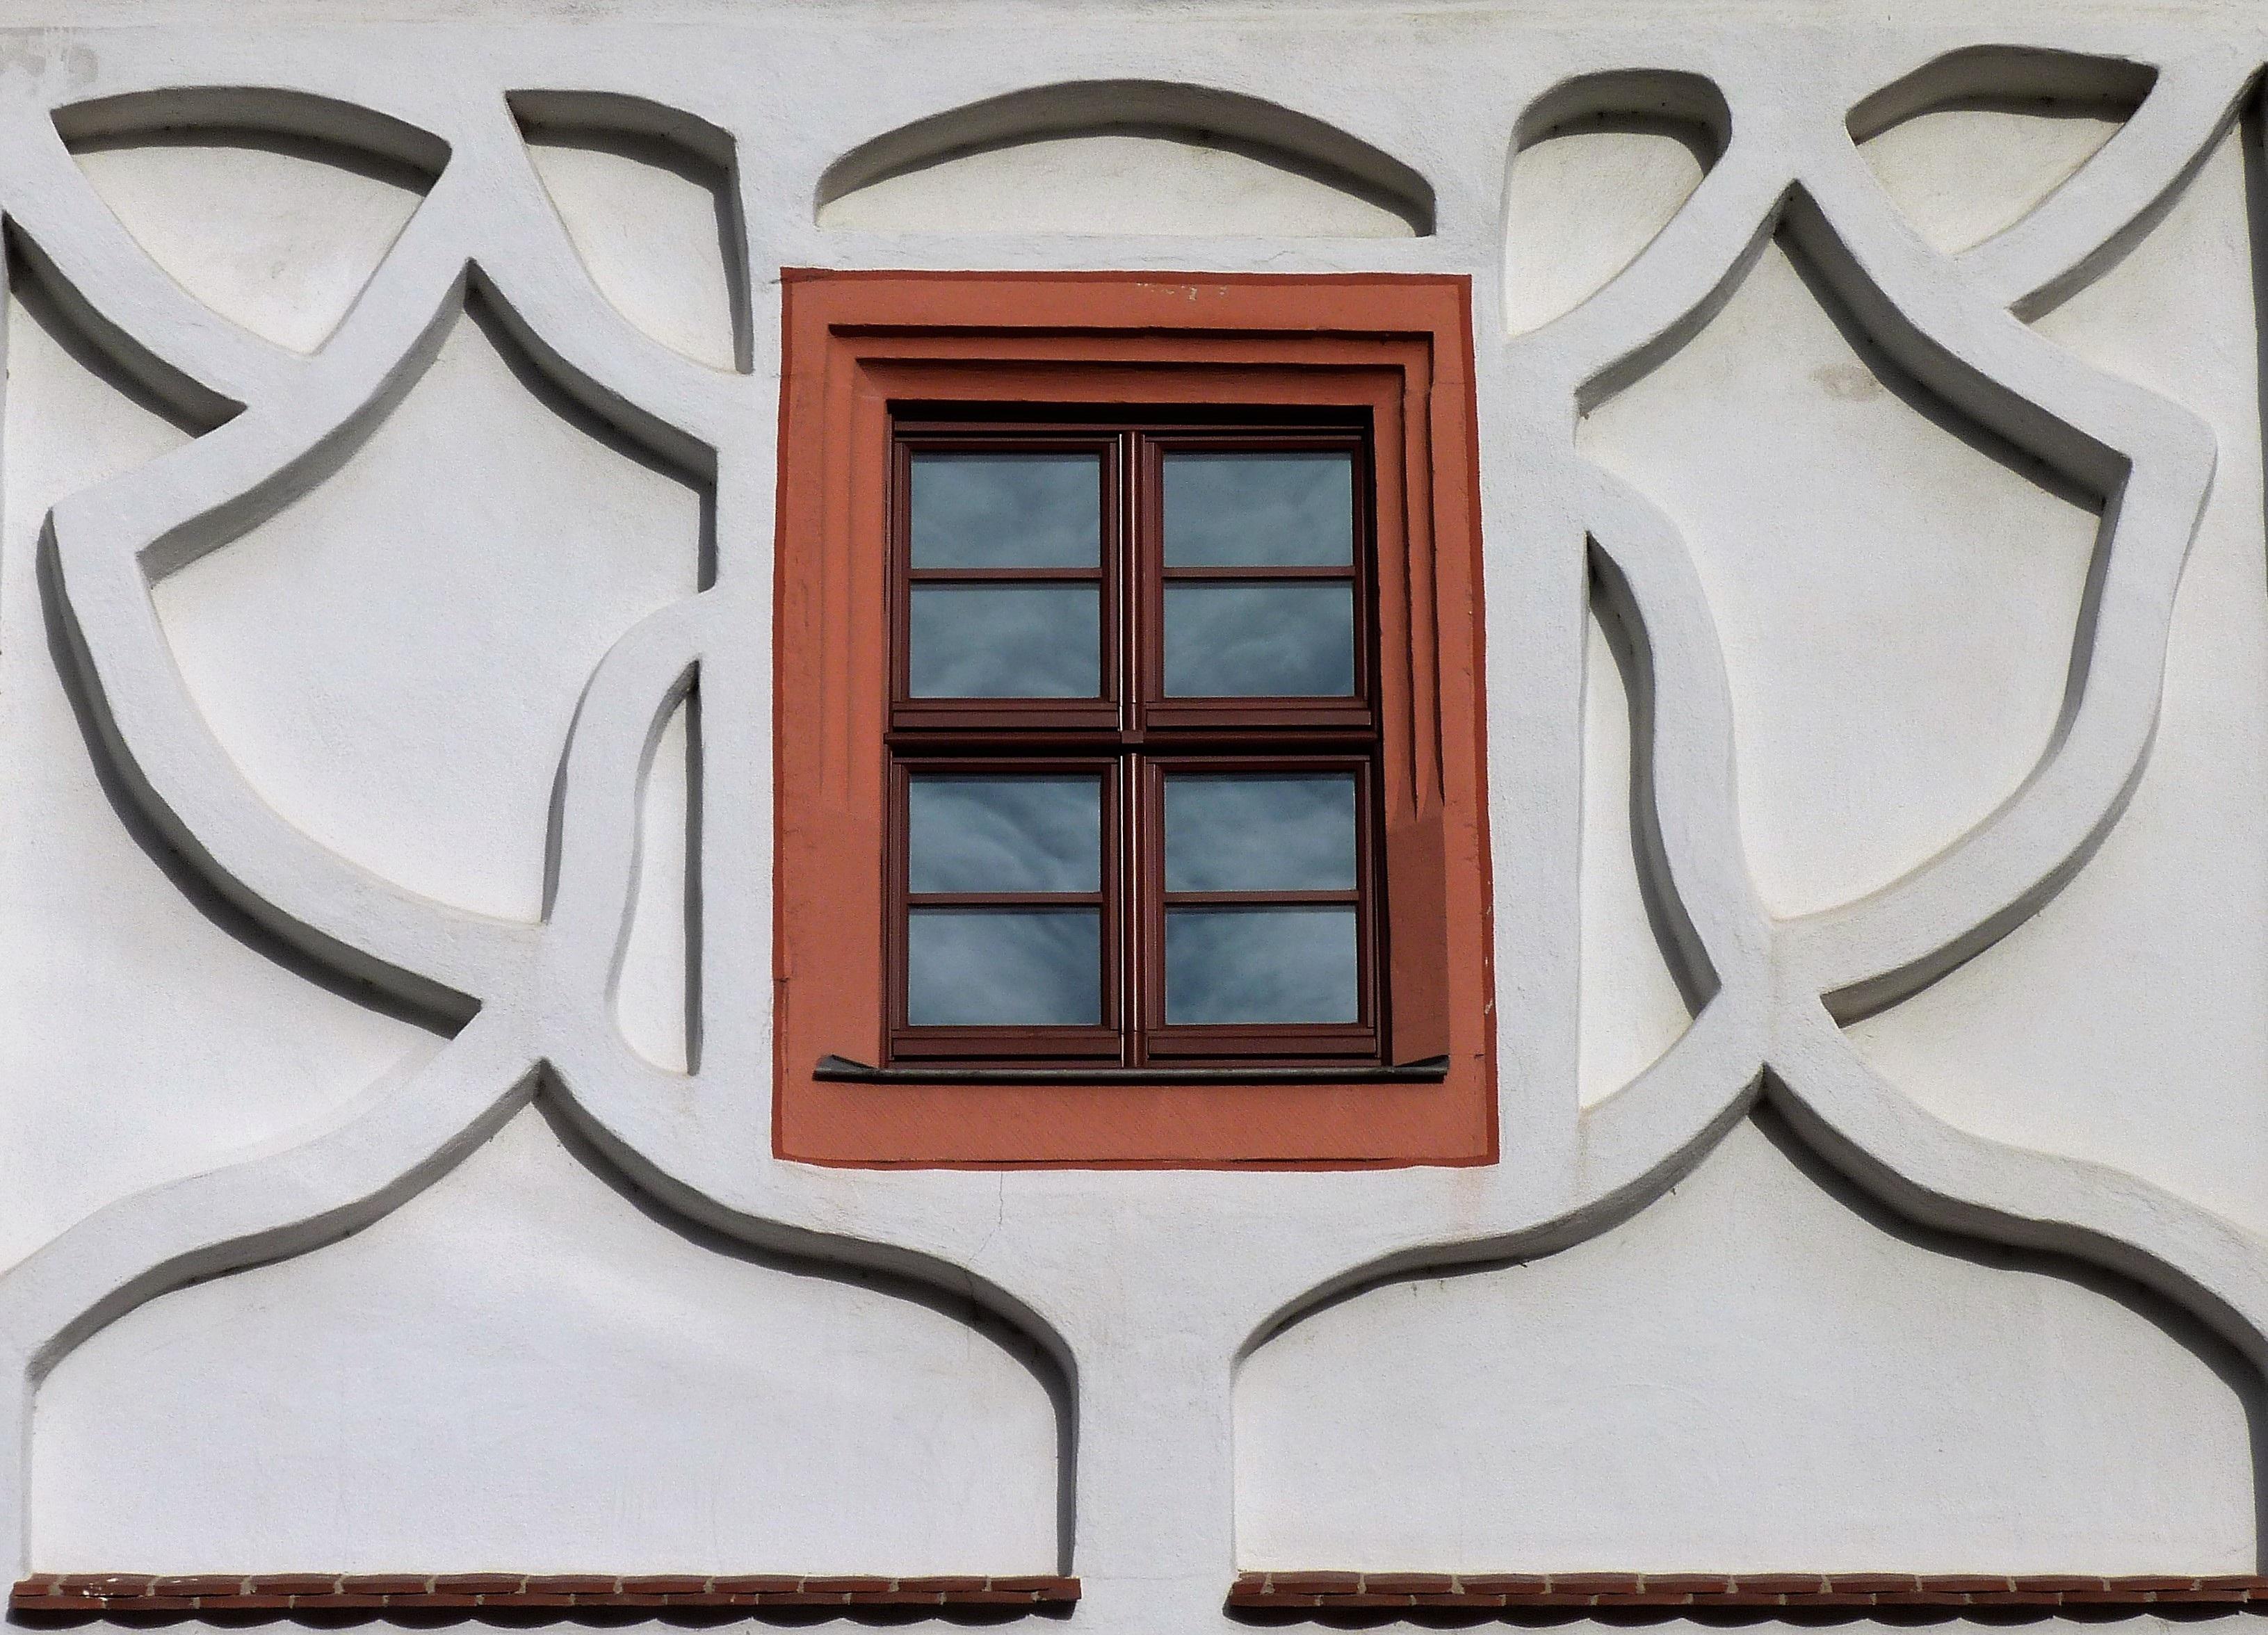 Fotos gratis : ventana, vaso, fachada, circulo, art, diseño ...